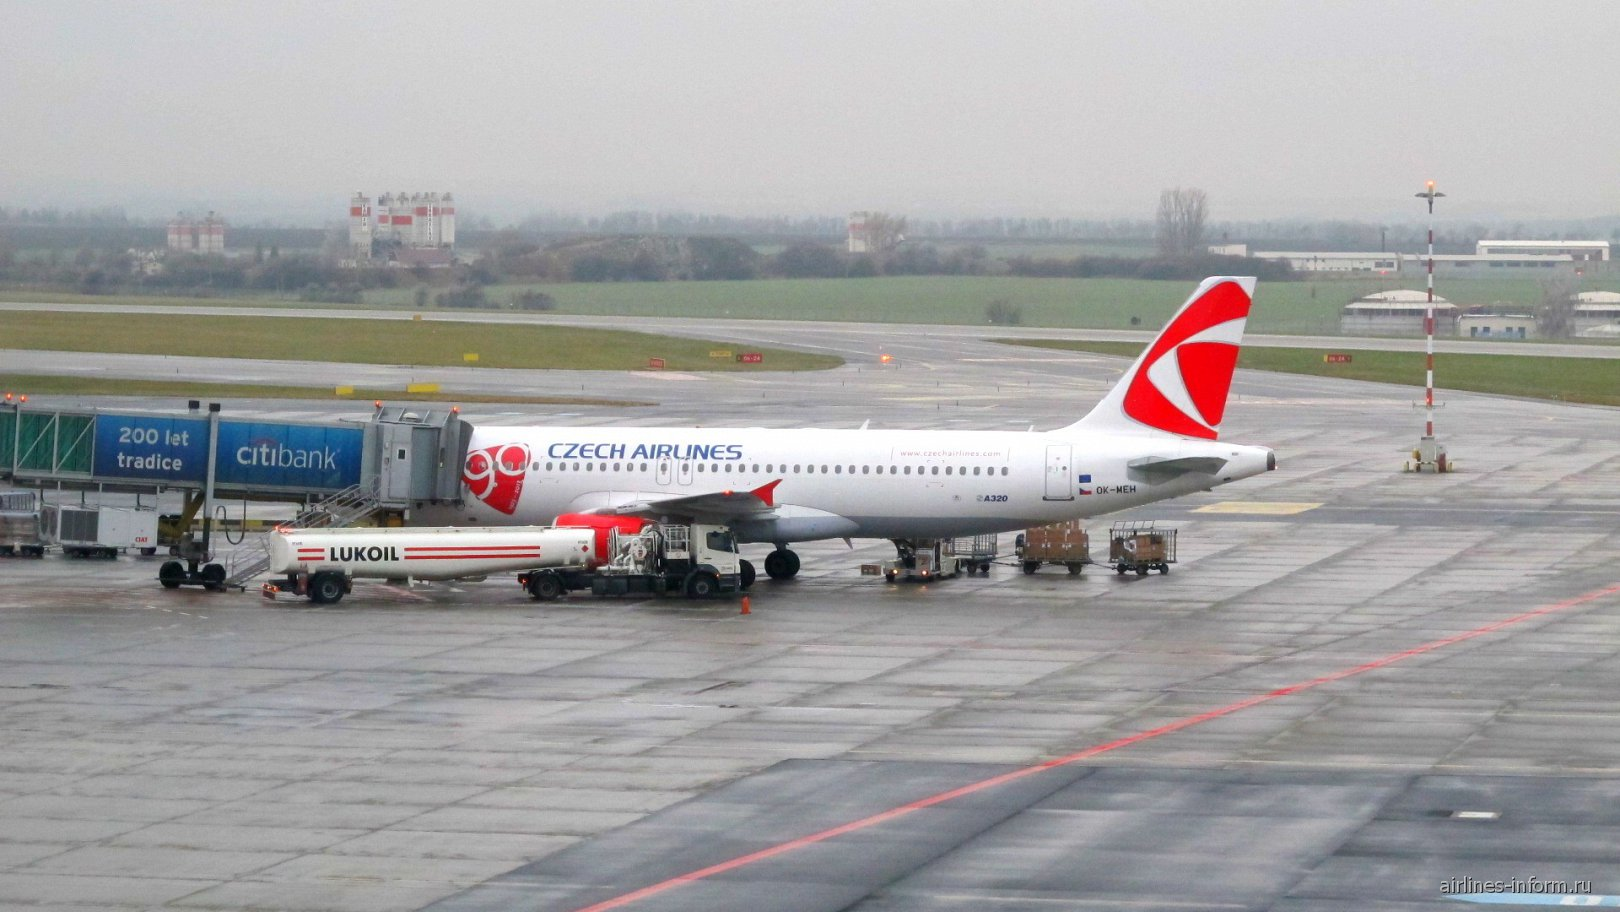 Airbus A320 Чешских авиалиний в аэропорту Прага Вацлав Гавел